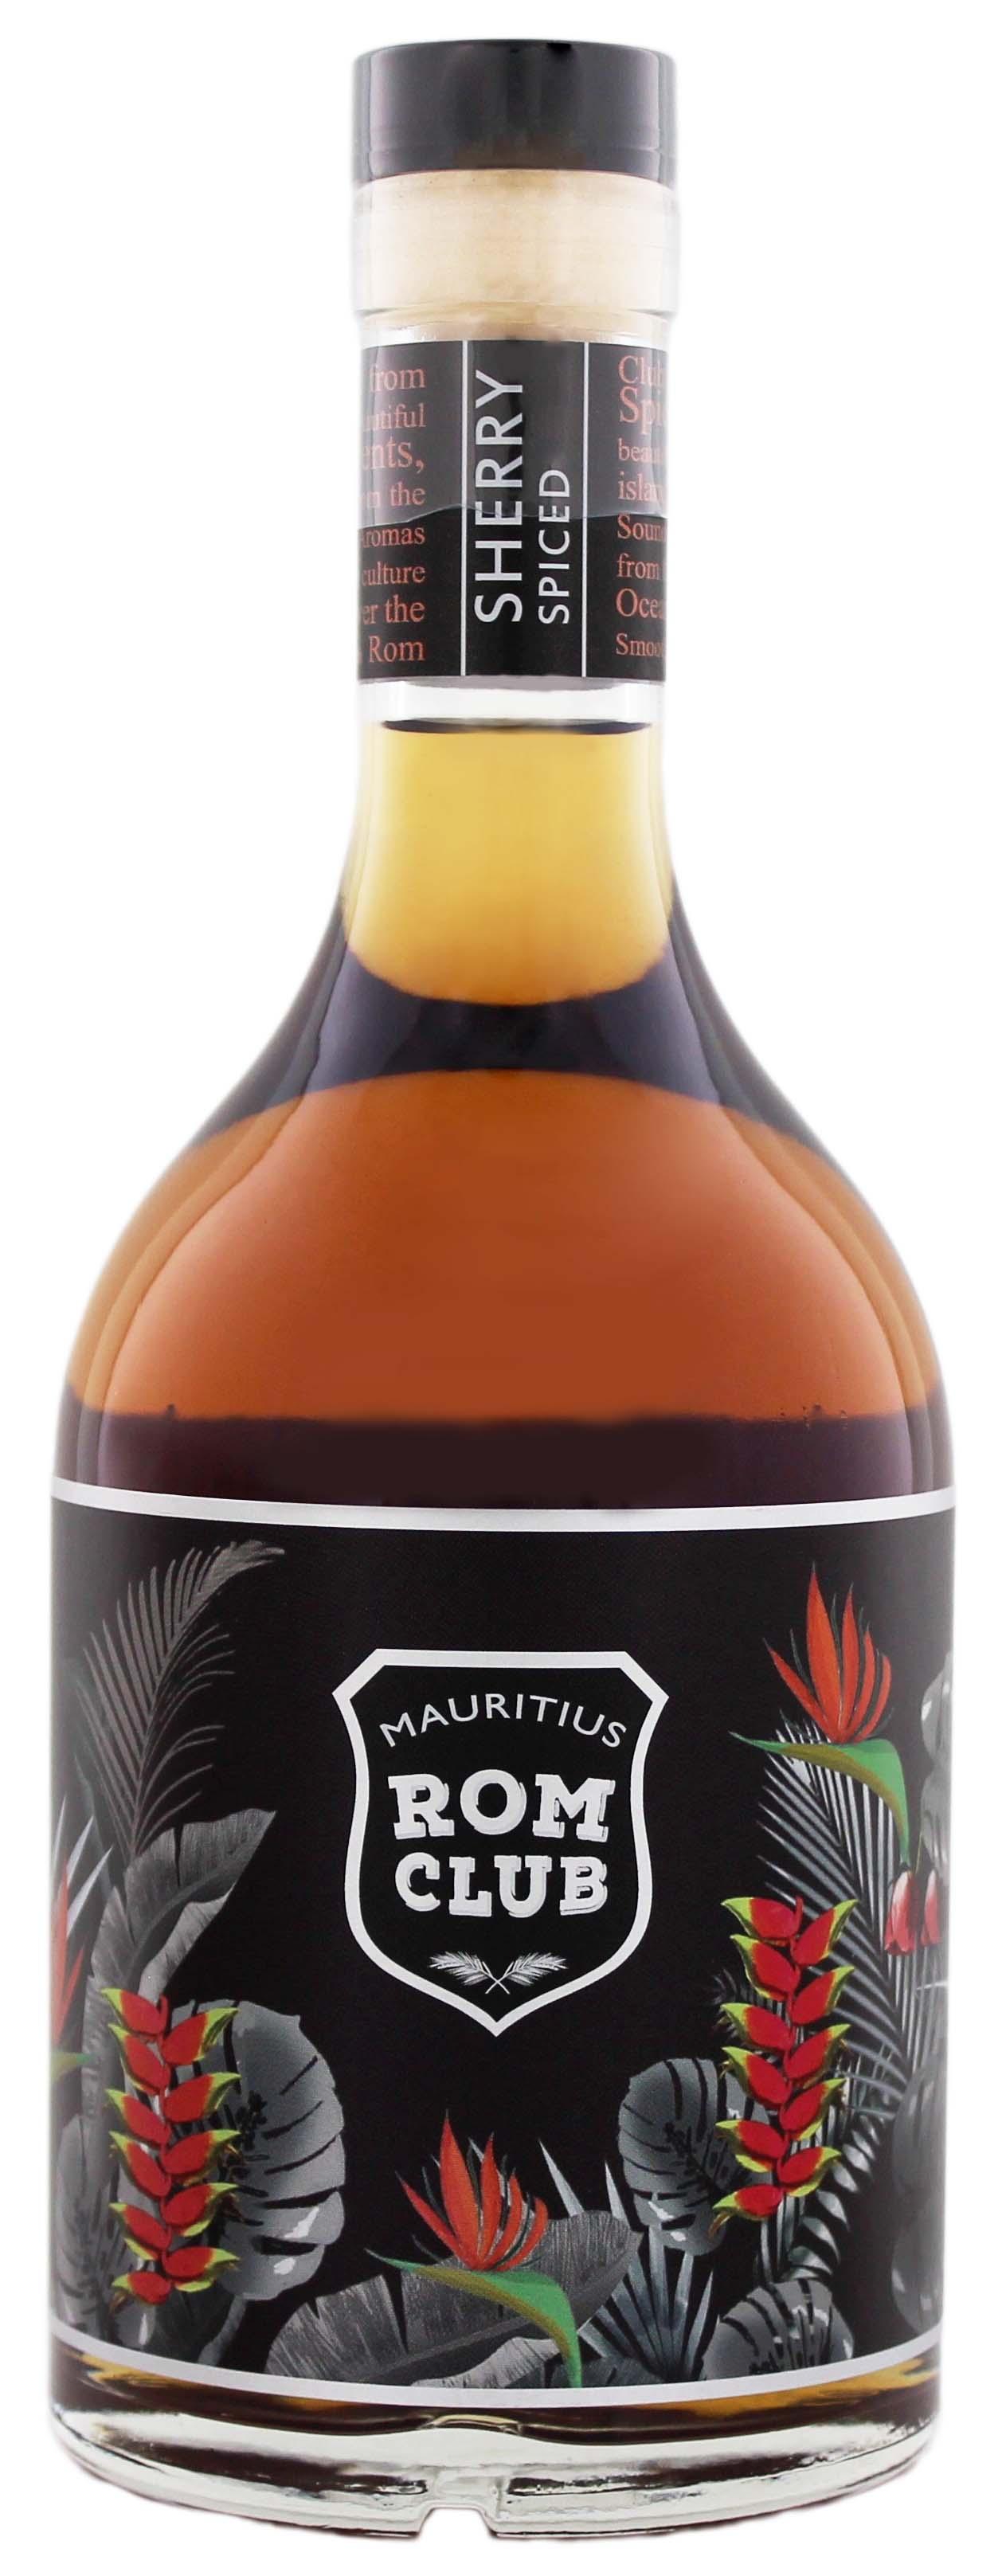 Mauritius Rom Club Sherry Spiced 0,7L